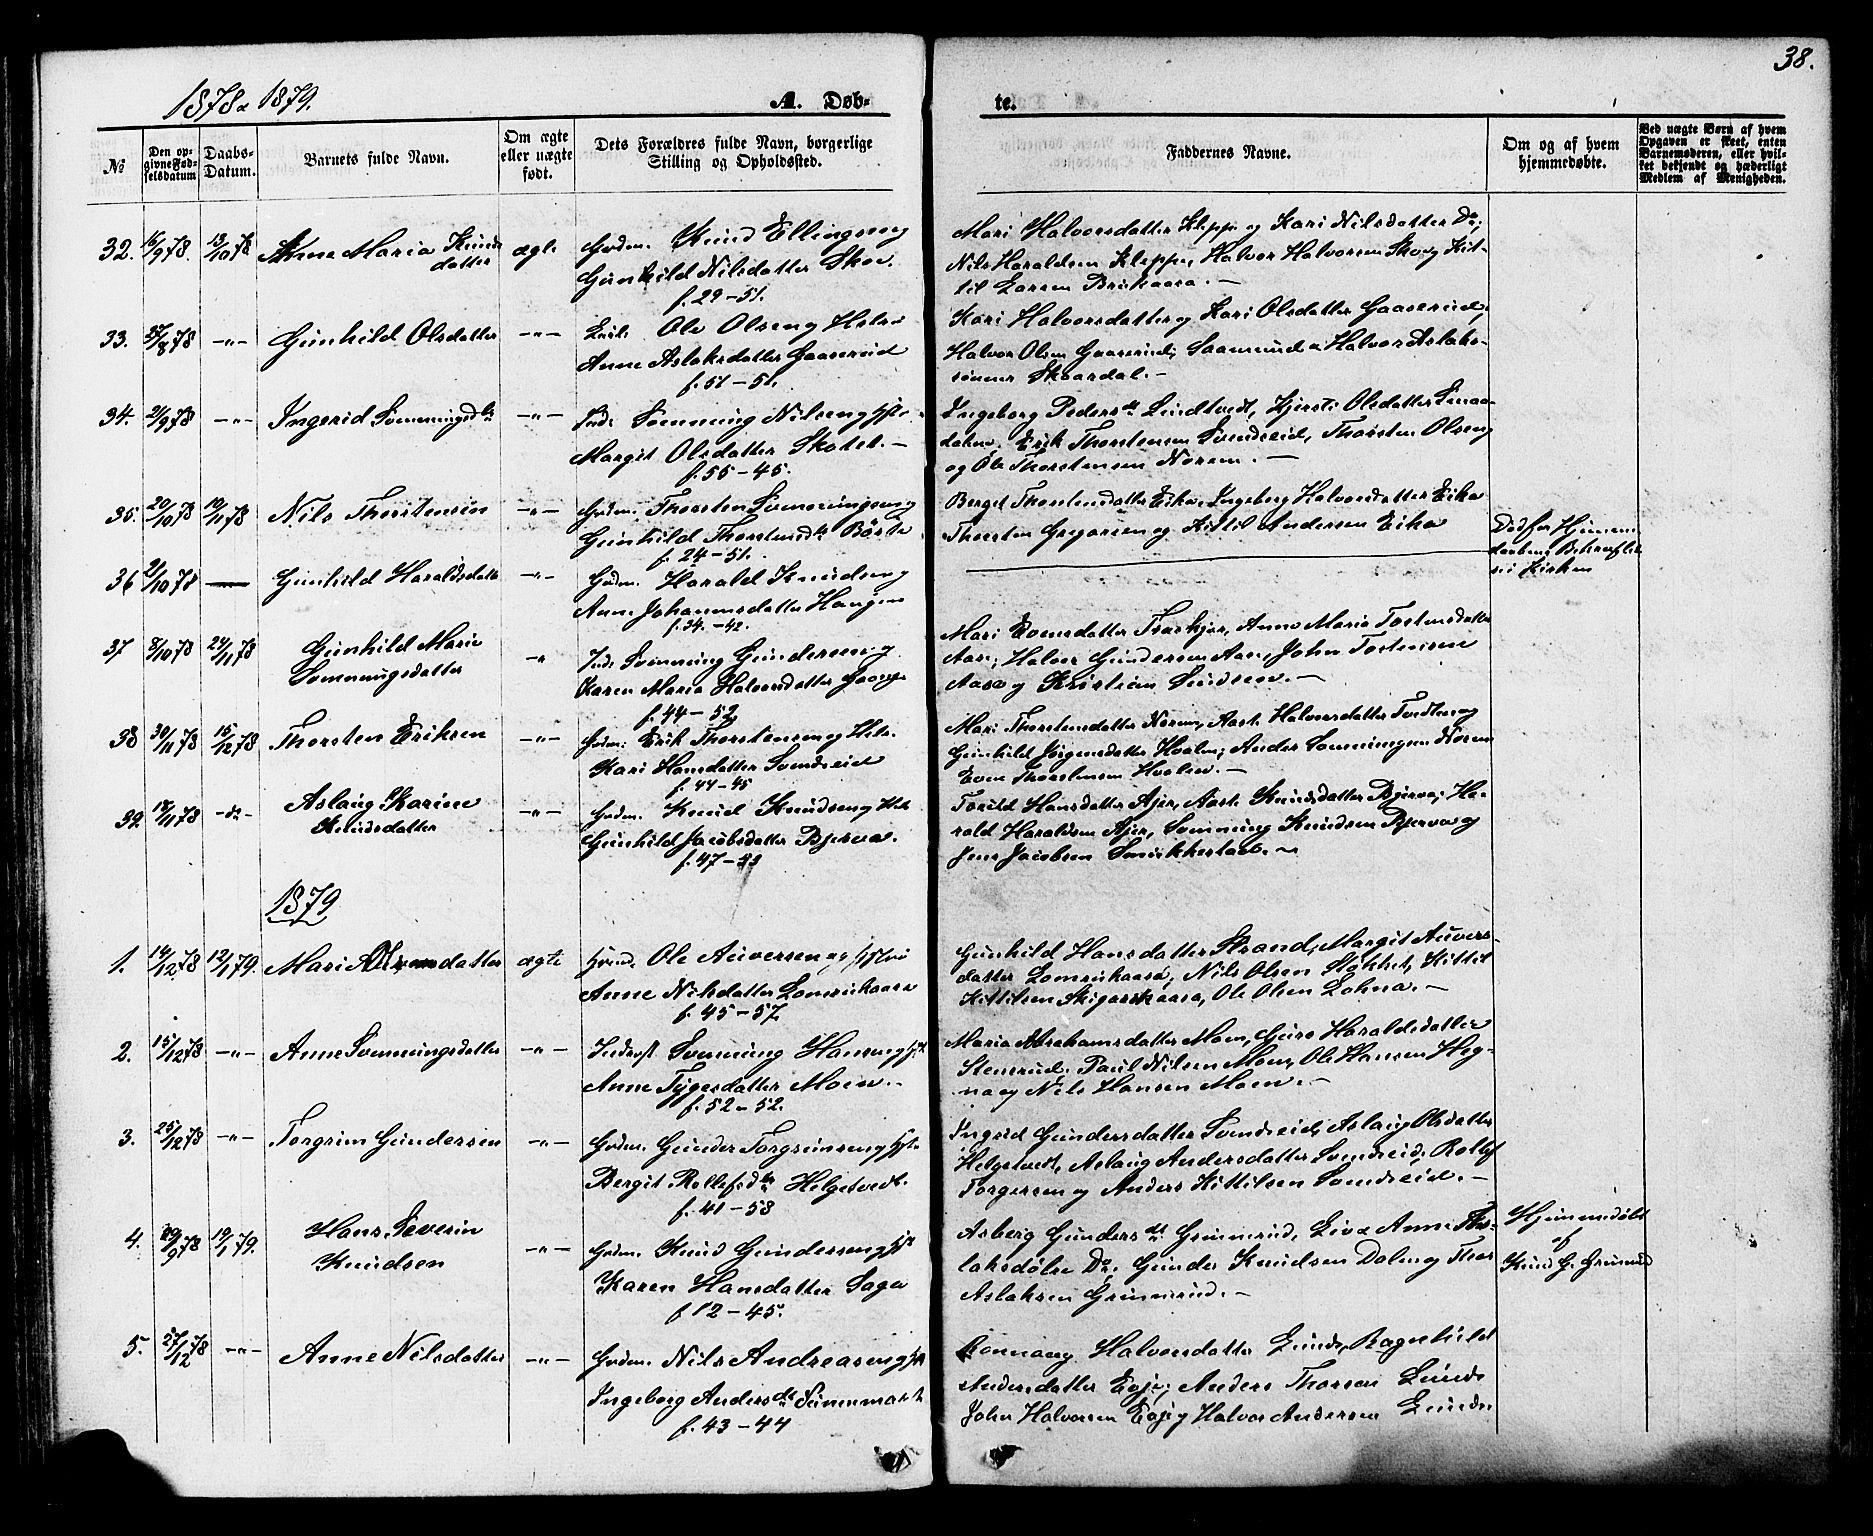 SAKO, Lunde kirkebøker, F/Fa/L0001: Ministerialbok nr. I 1, 1866-1883, s. 38